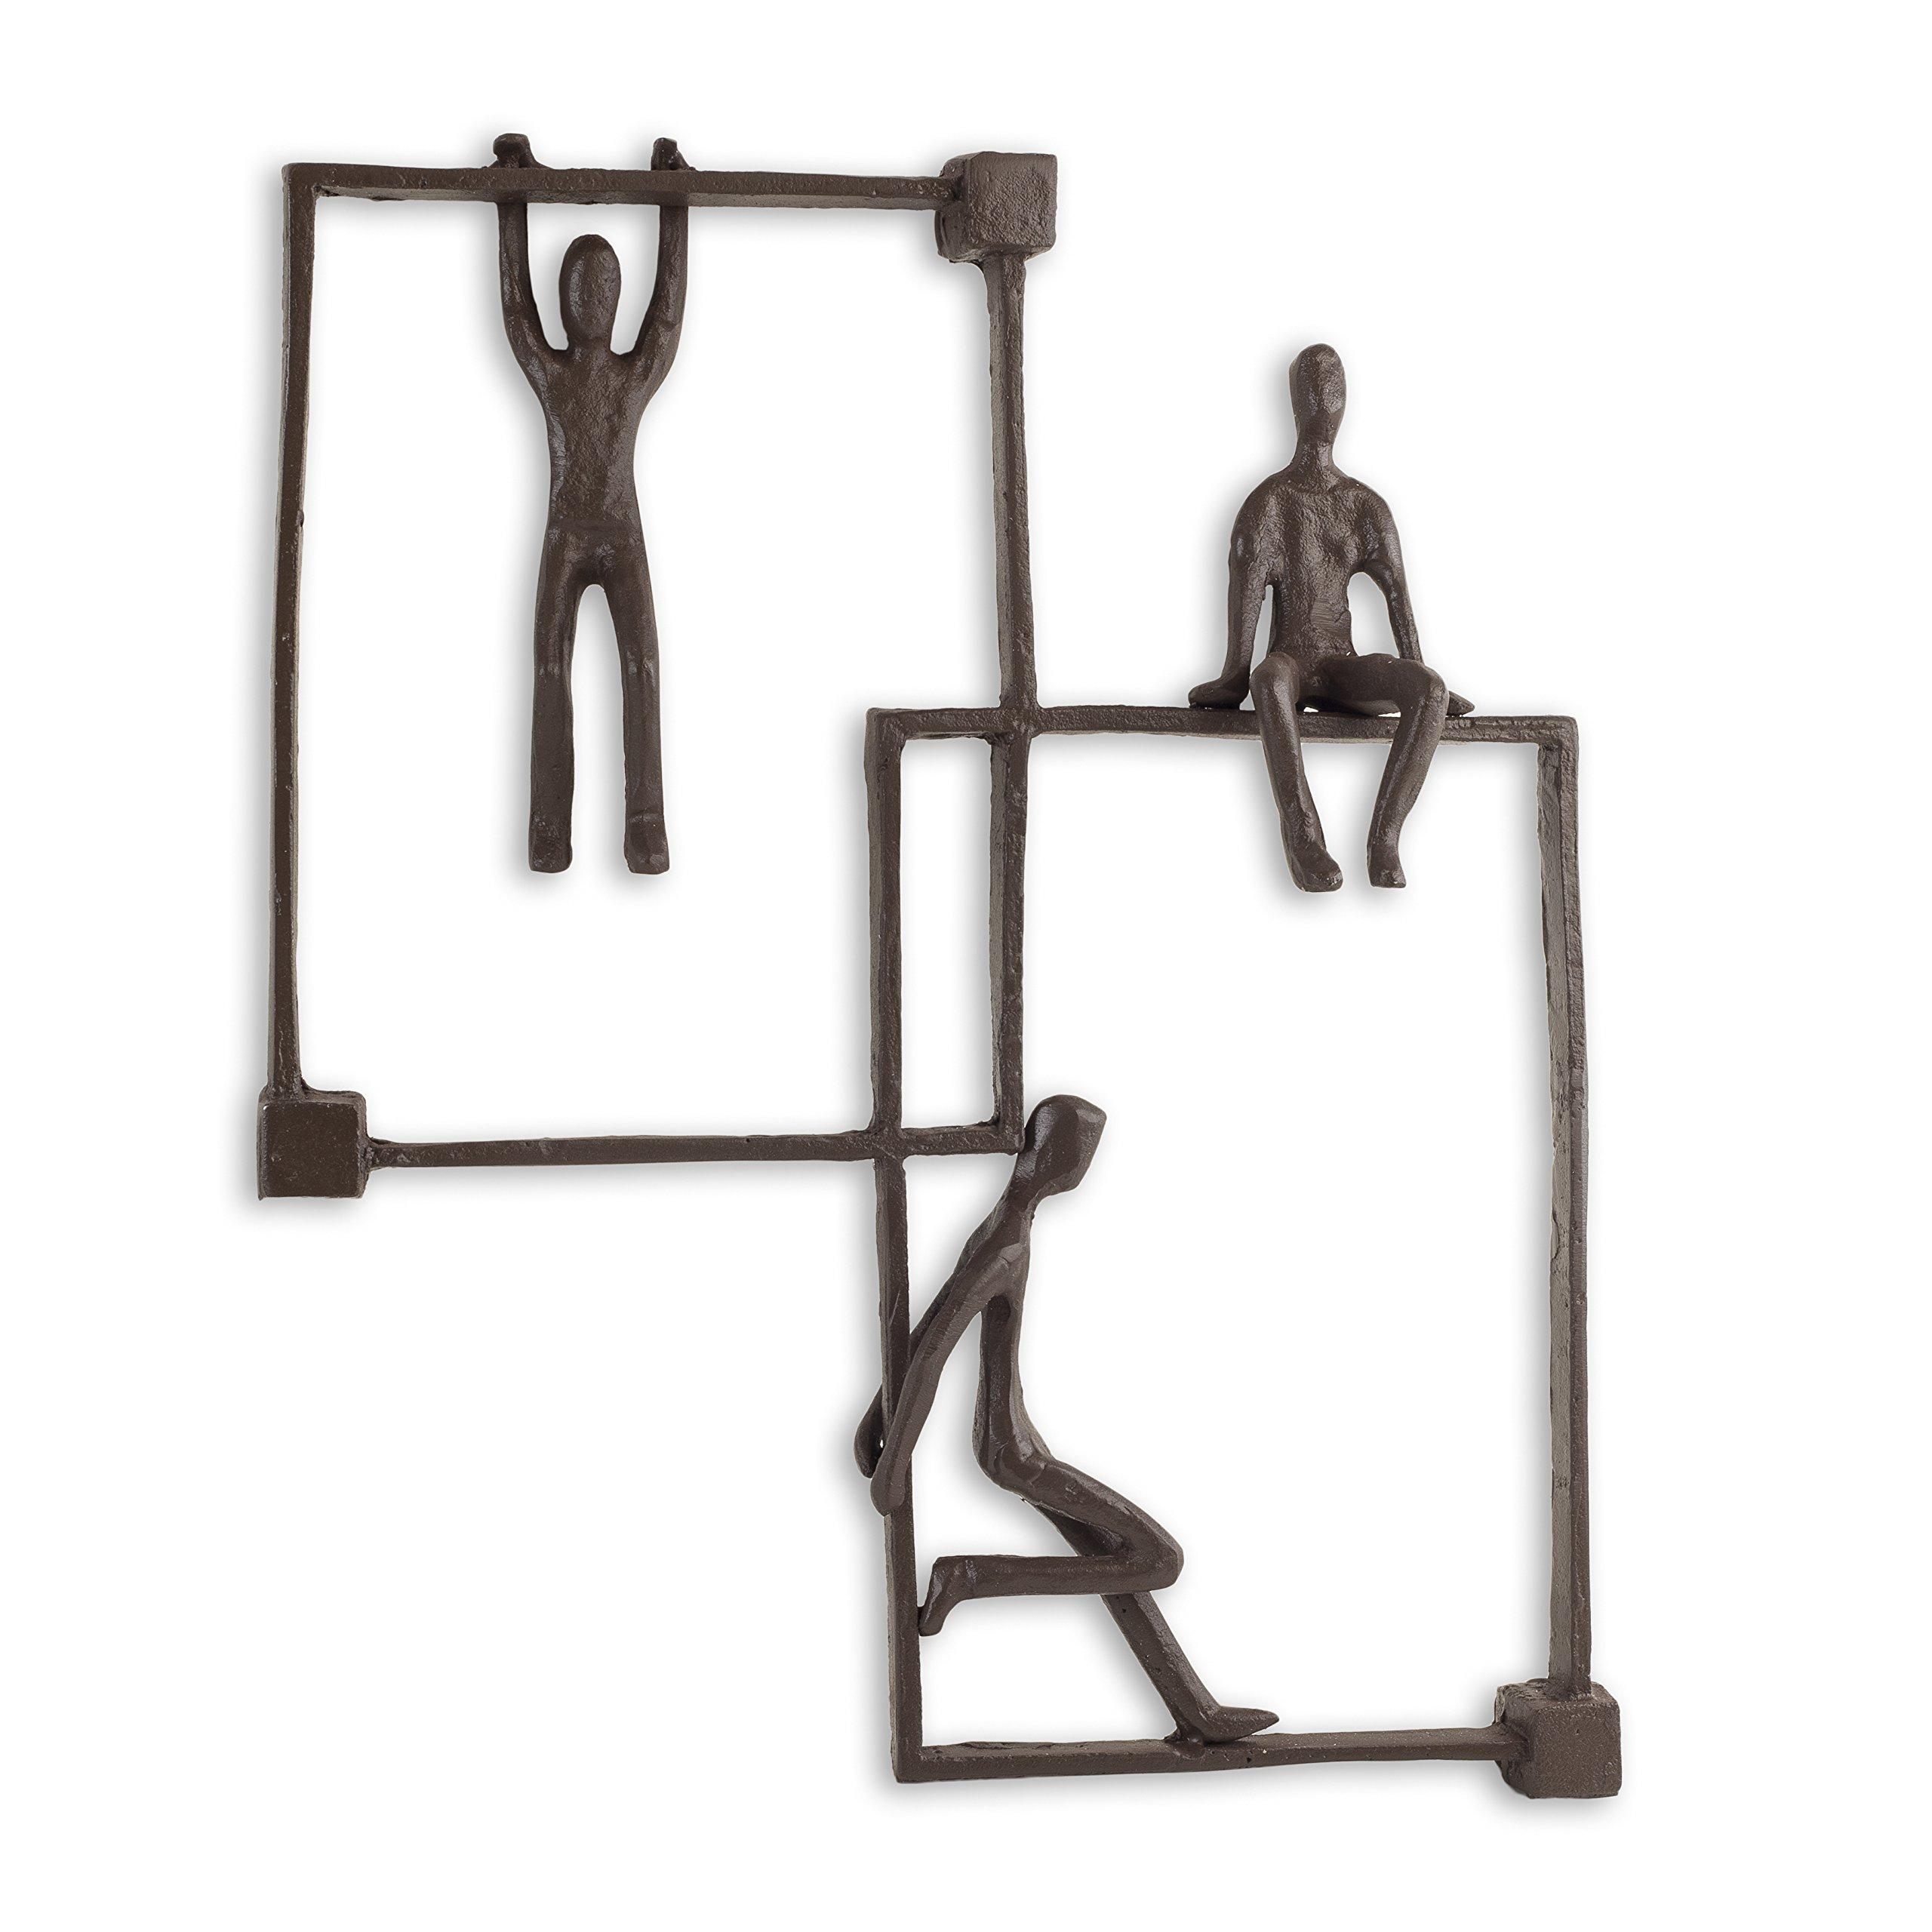 Danya B ZI15216 Metal Wall Art – Three Playful Children on Frames Cast Iron Wall Hanging by Danya B.